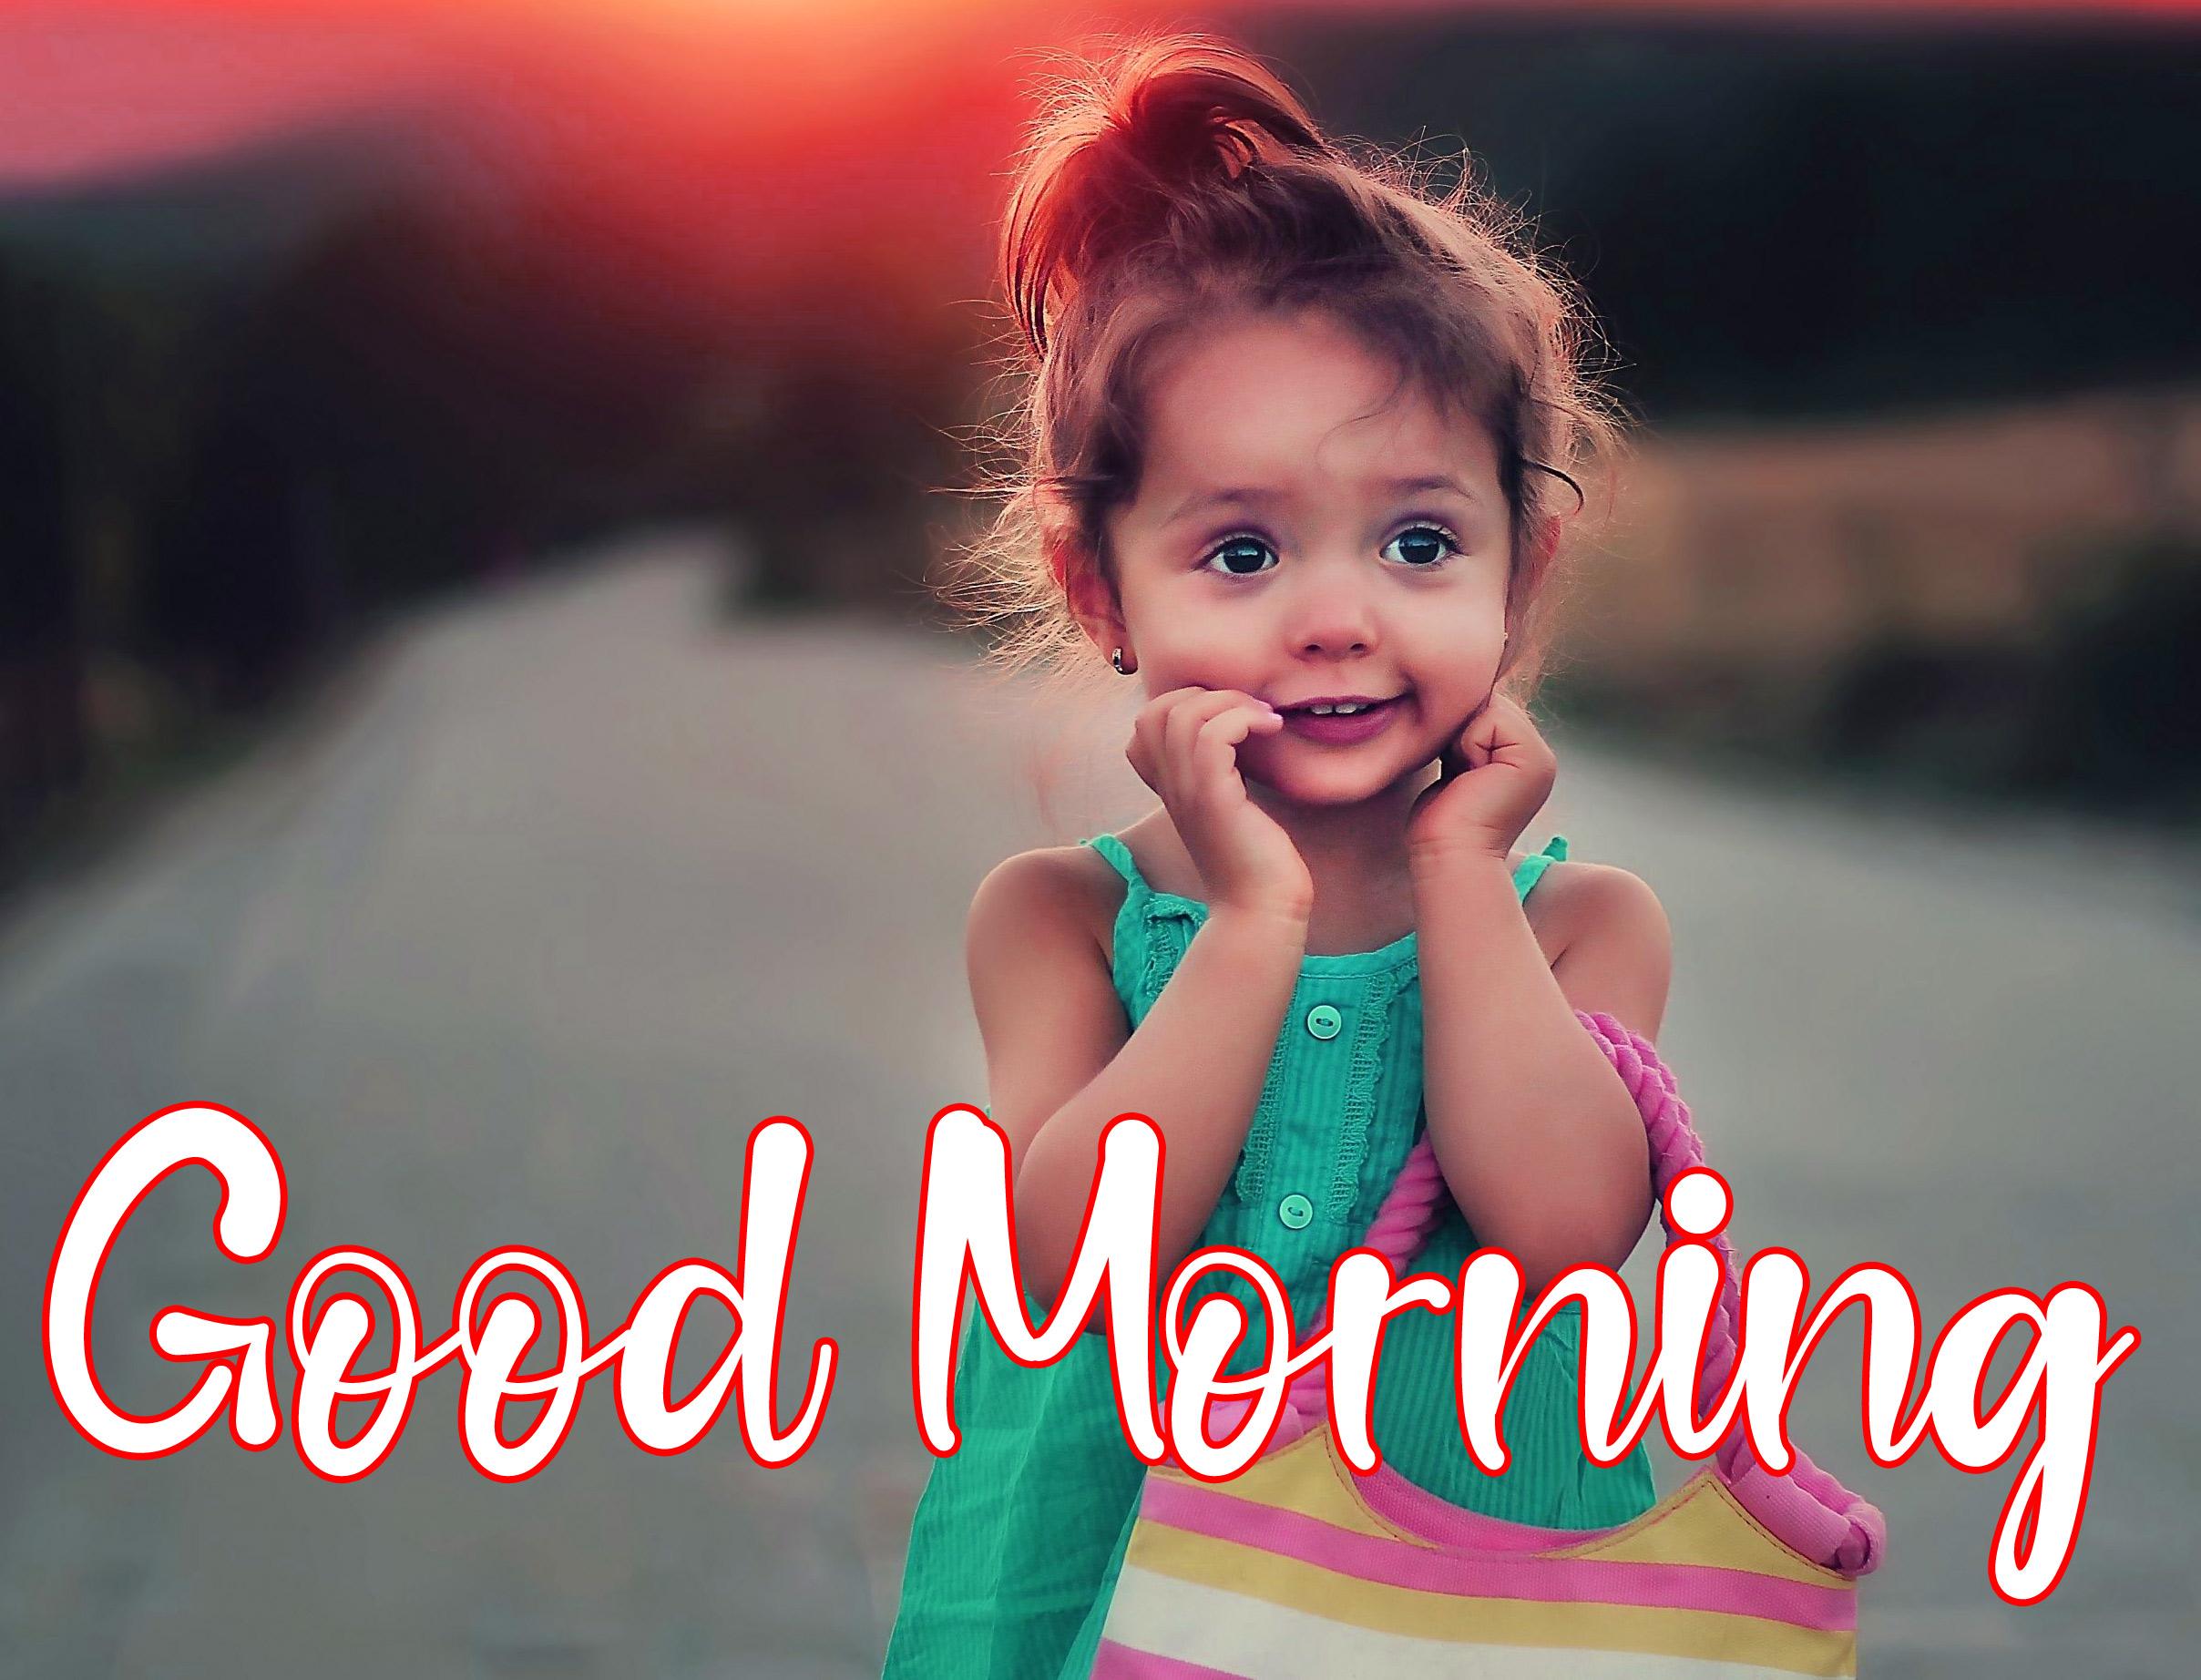 good morning Images for girls 9